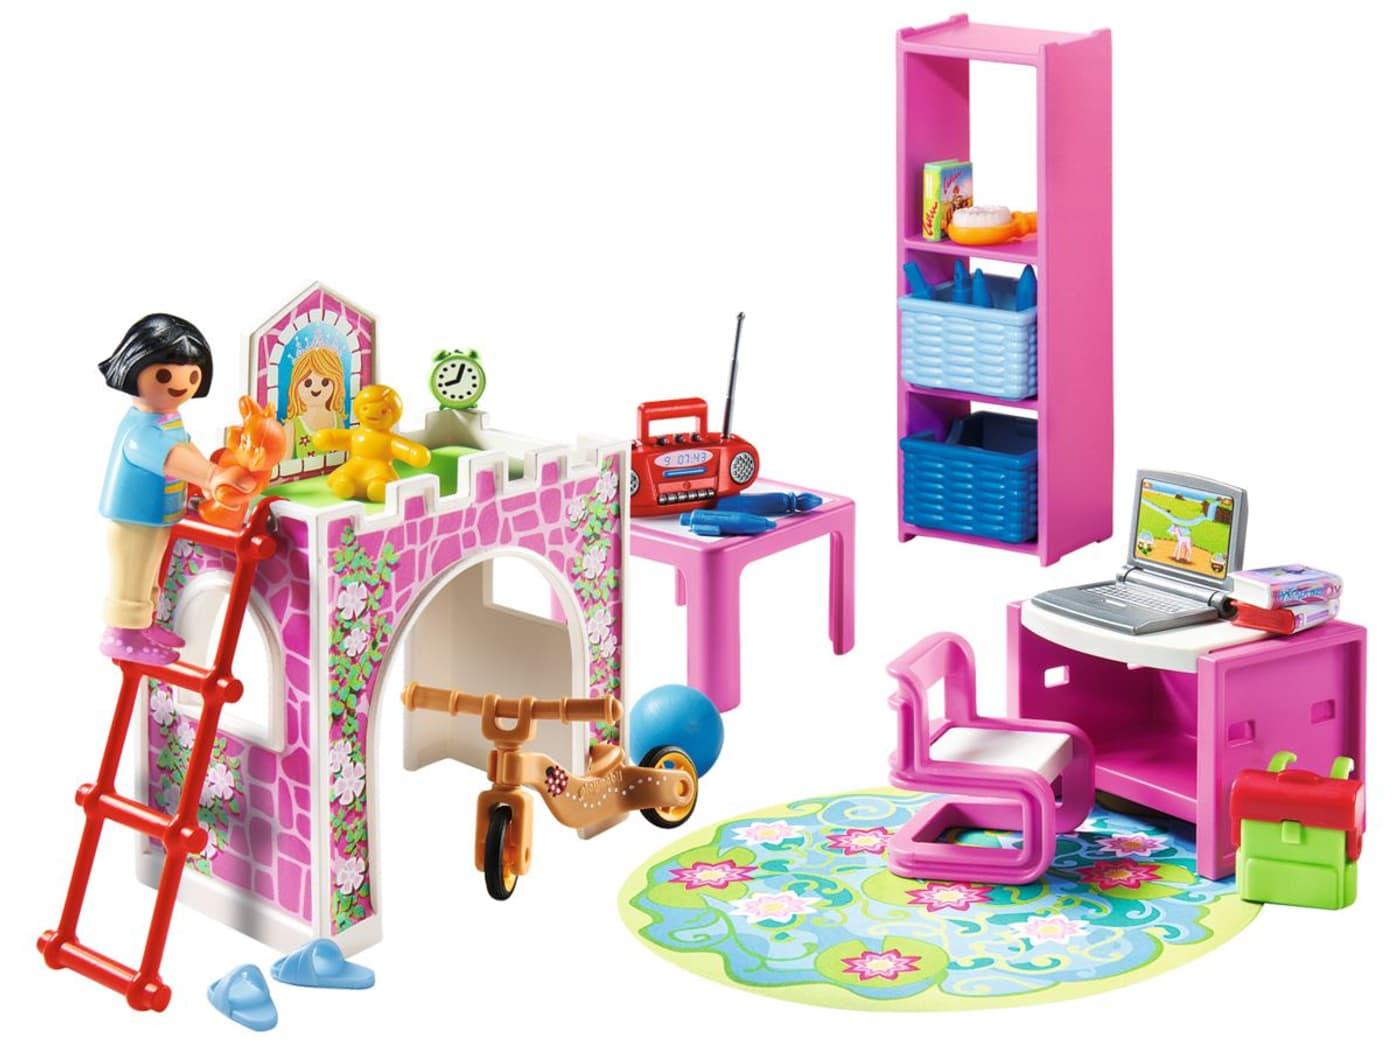 Playmobil Fröhliches Kinderzimmer